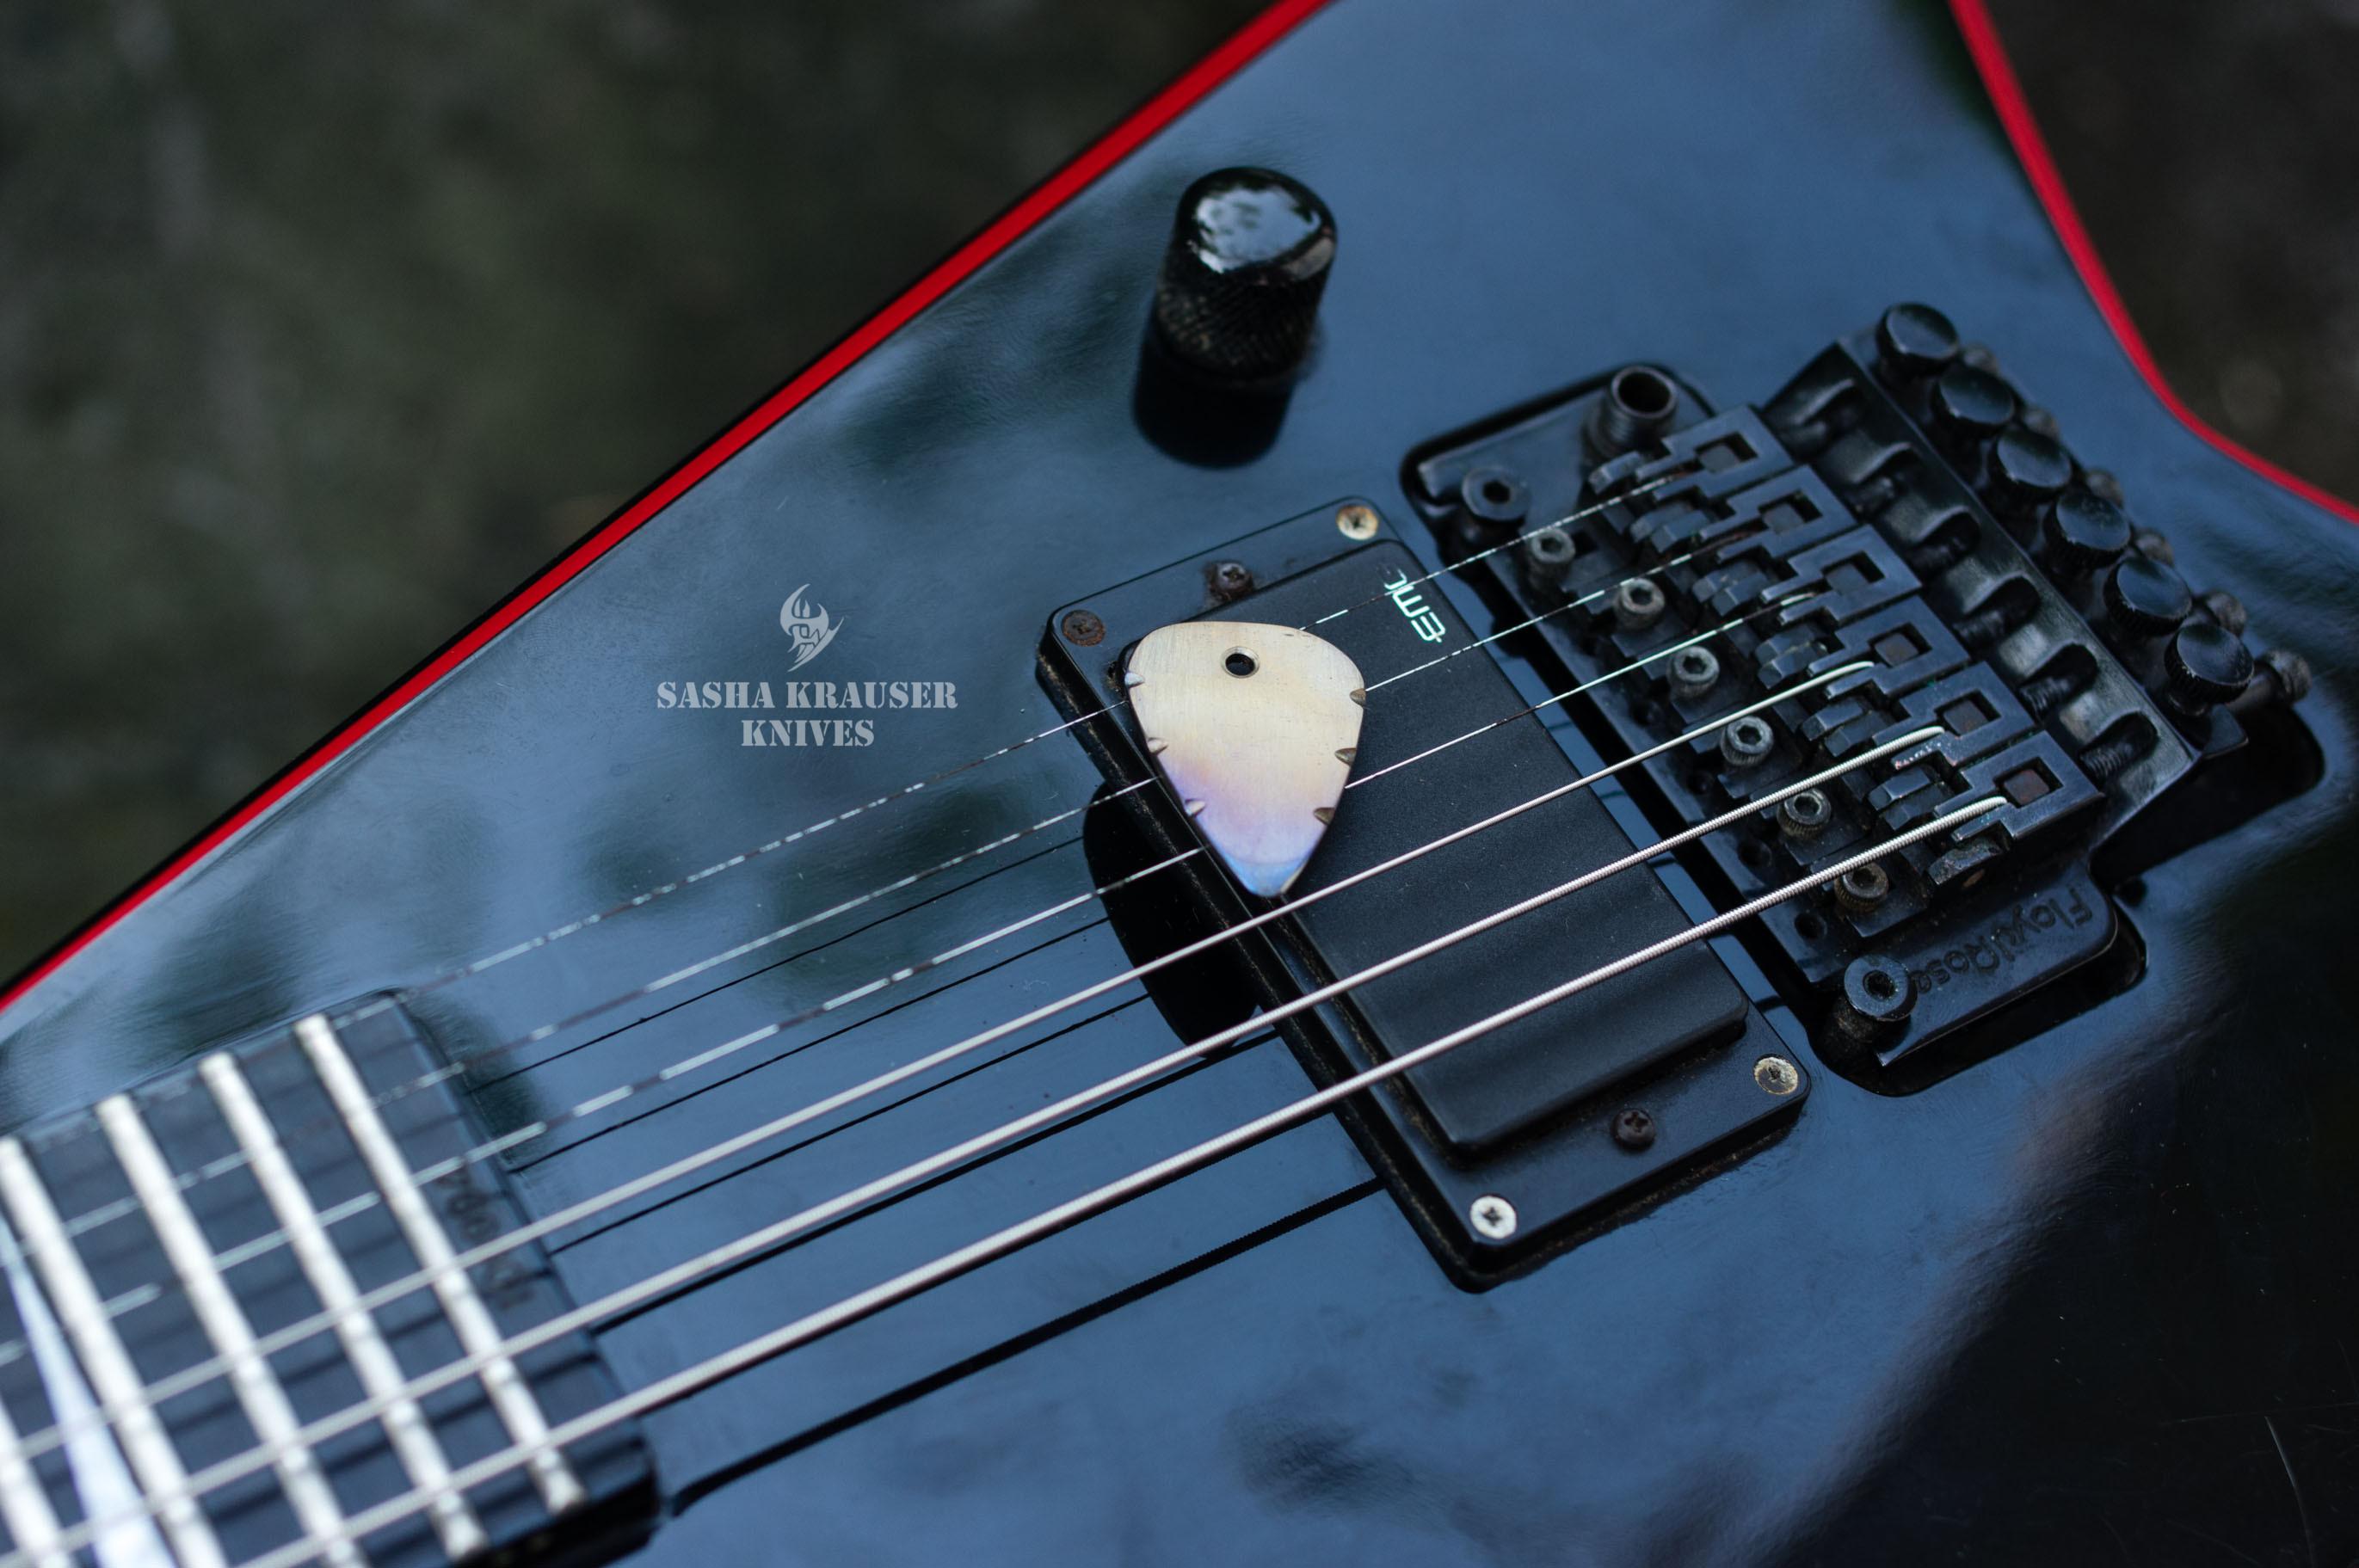 flamed titane guitar pick